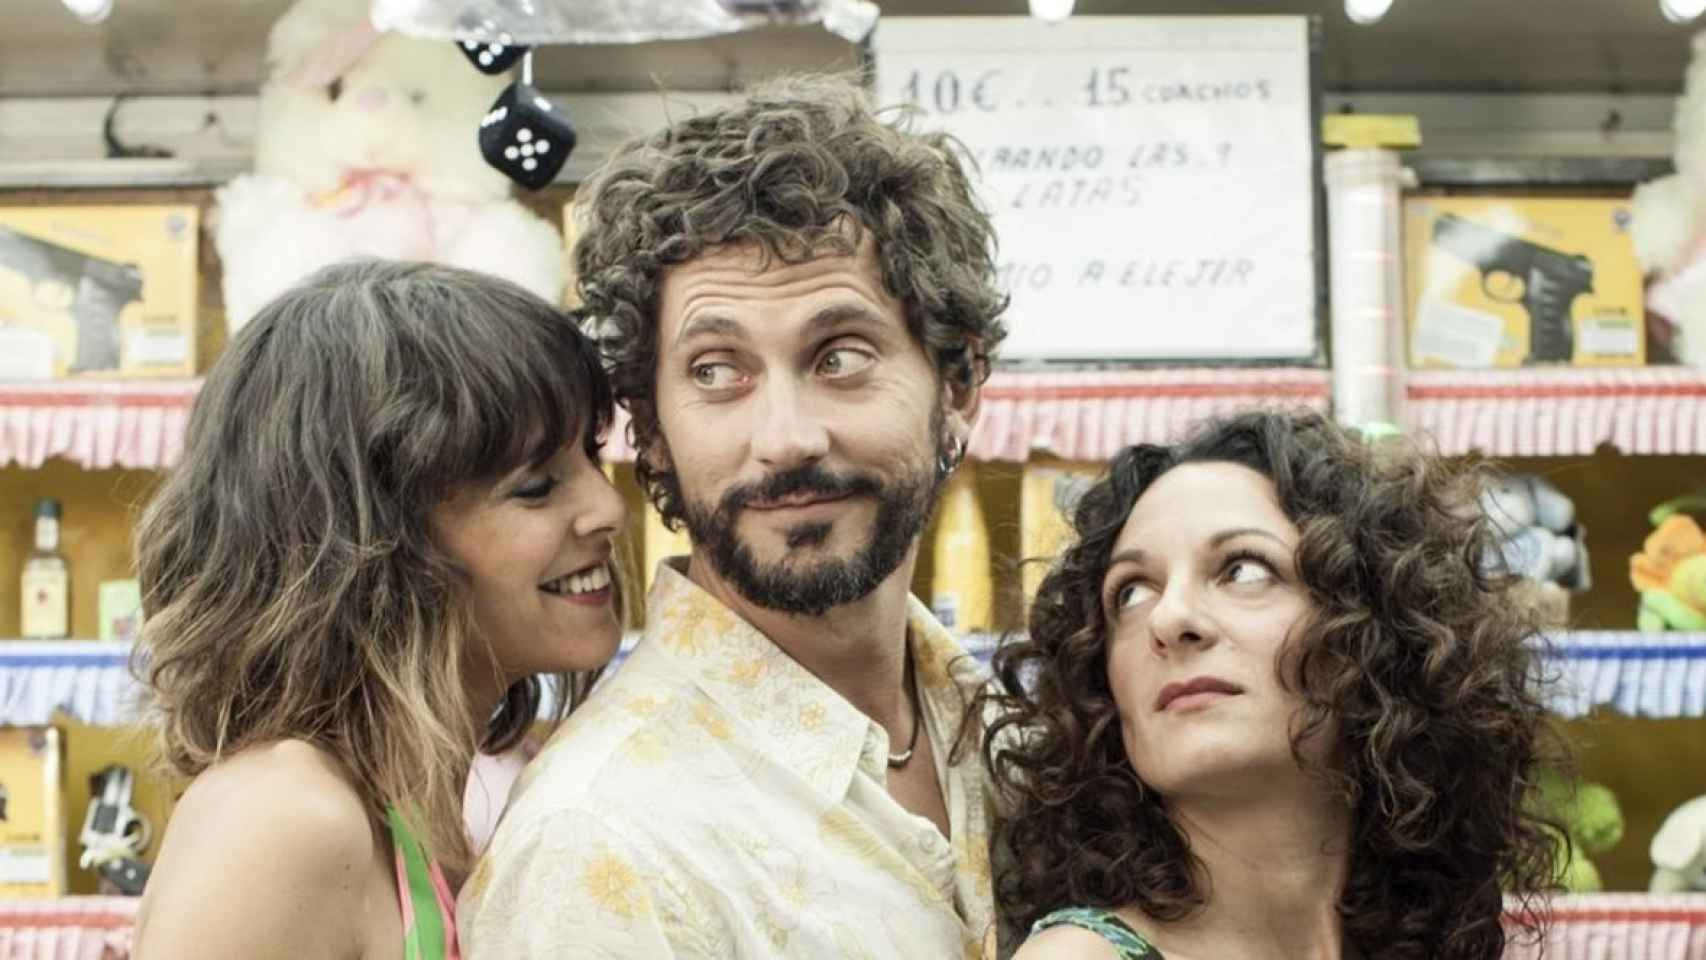 Belén Cuesta, Paco León y Ana Katz en Kiki.